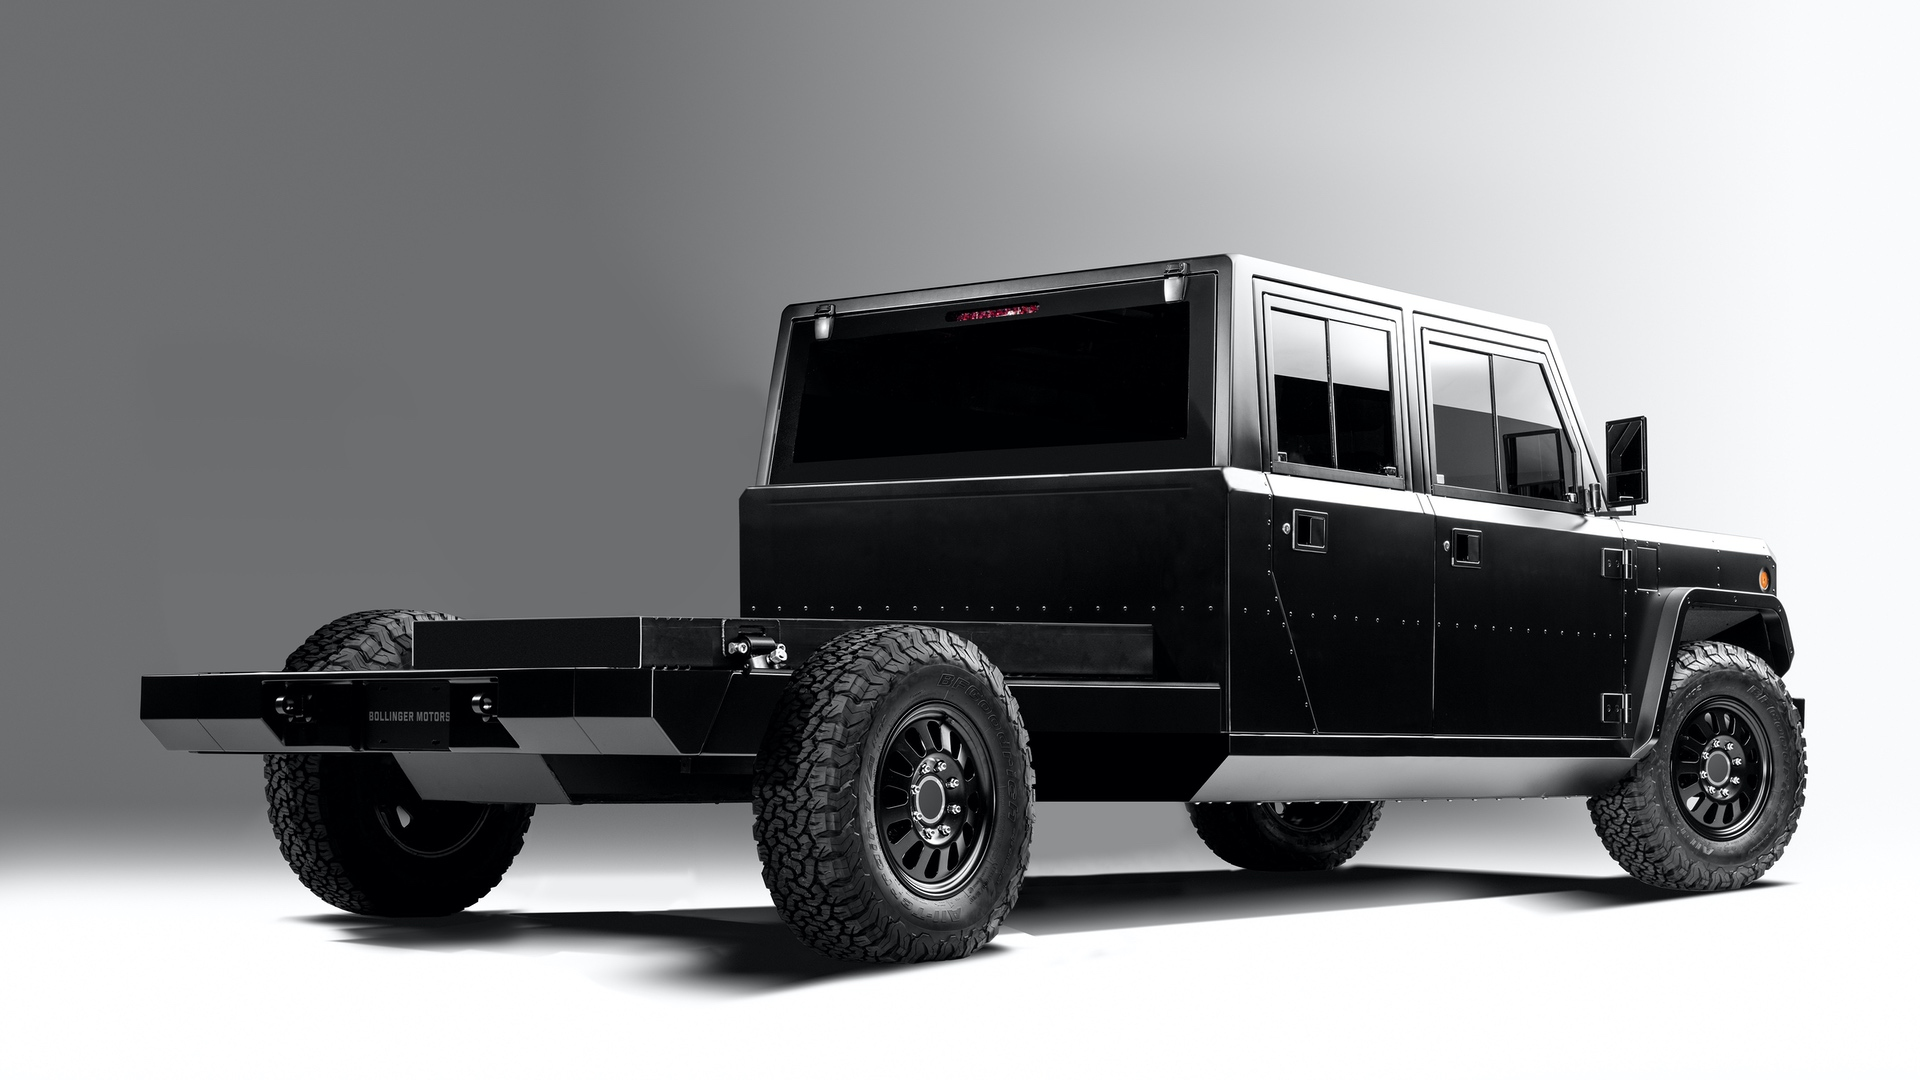 Bollinger-Motors-B2-Chassis-Cab-4-Door-Closed-3_4-rear